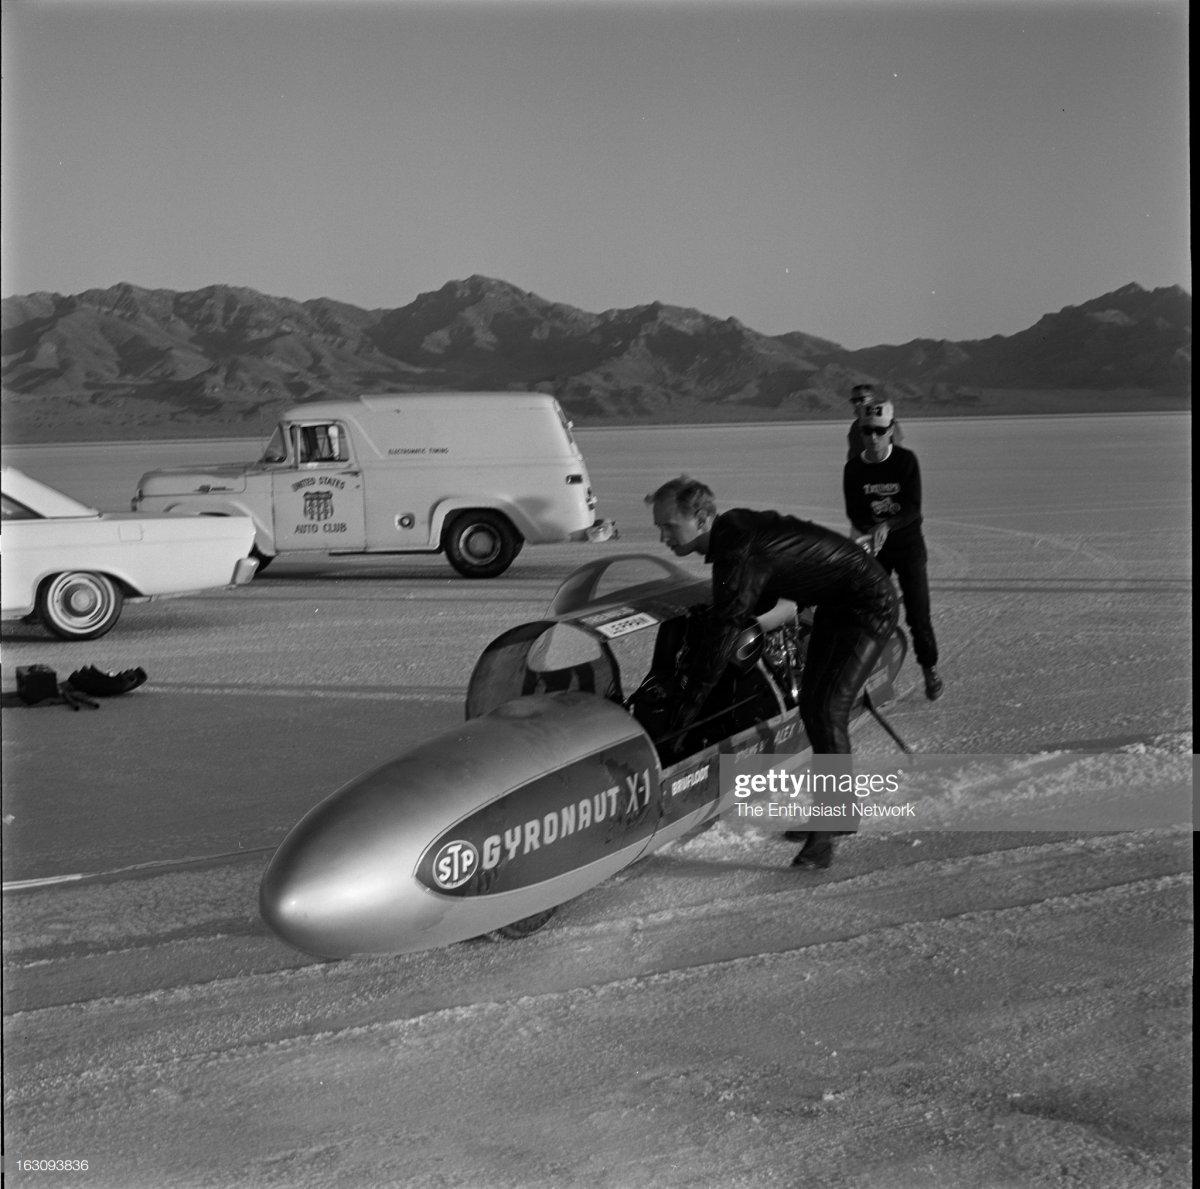 57 1965 - Bonneville Land Speed.jpg